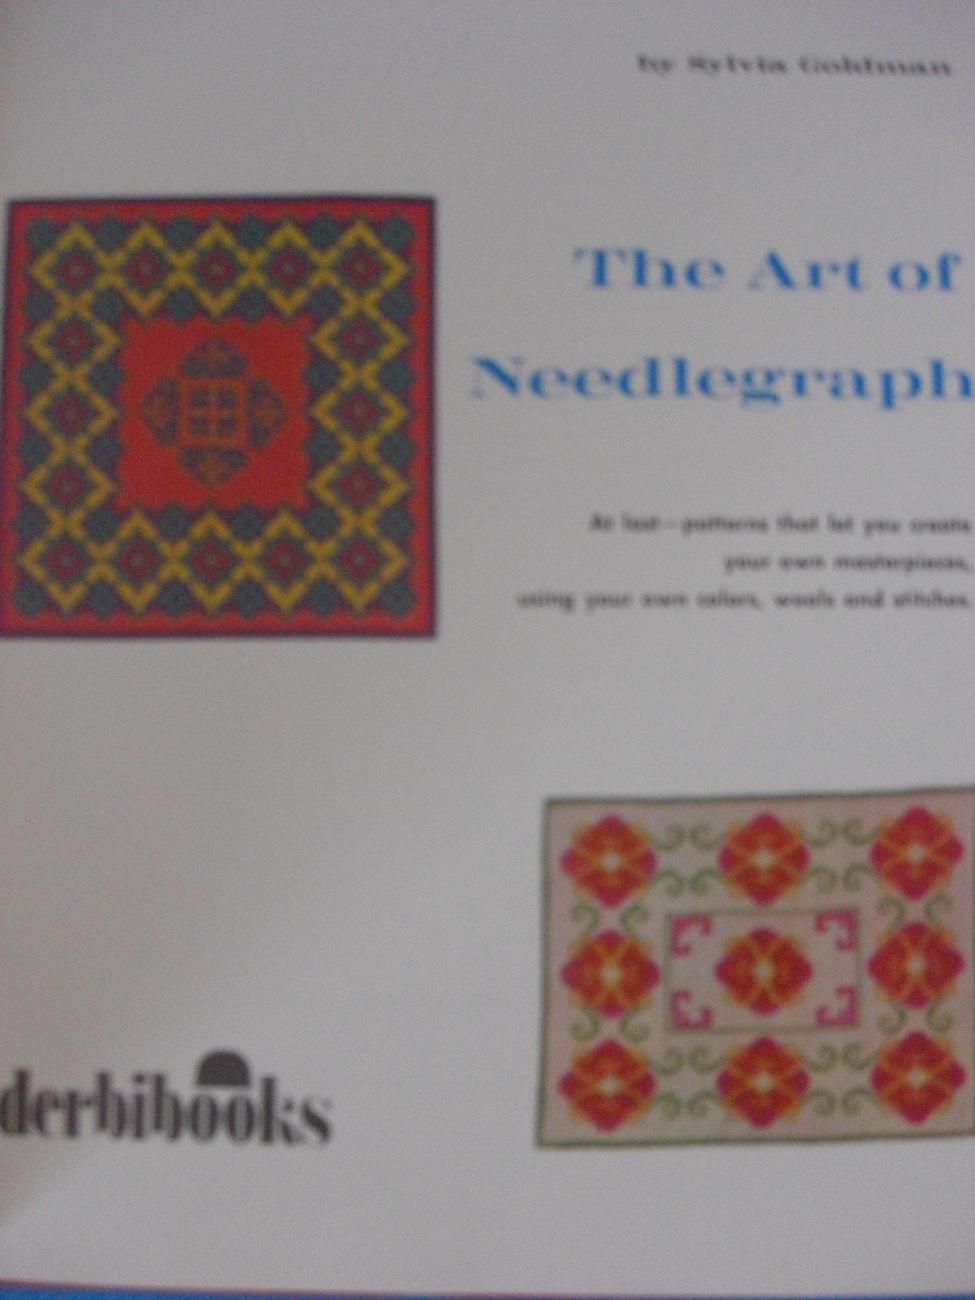 needlepoint machine